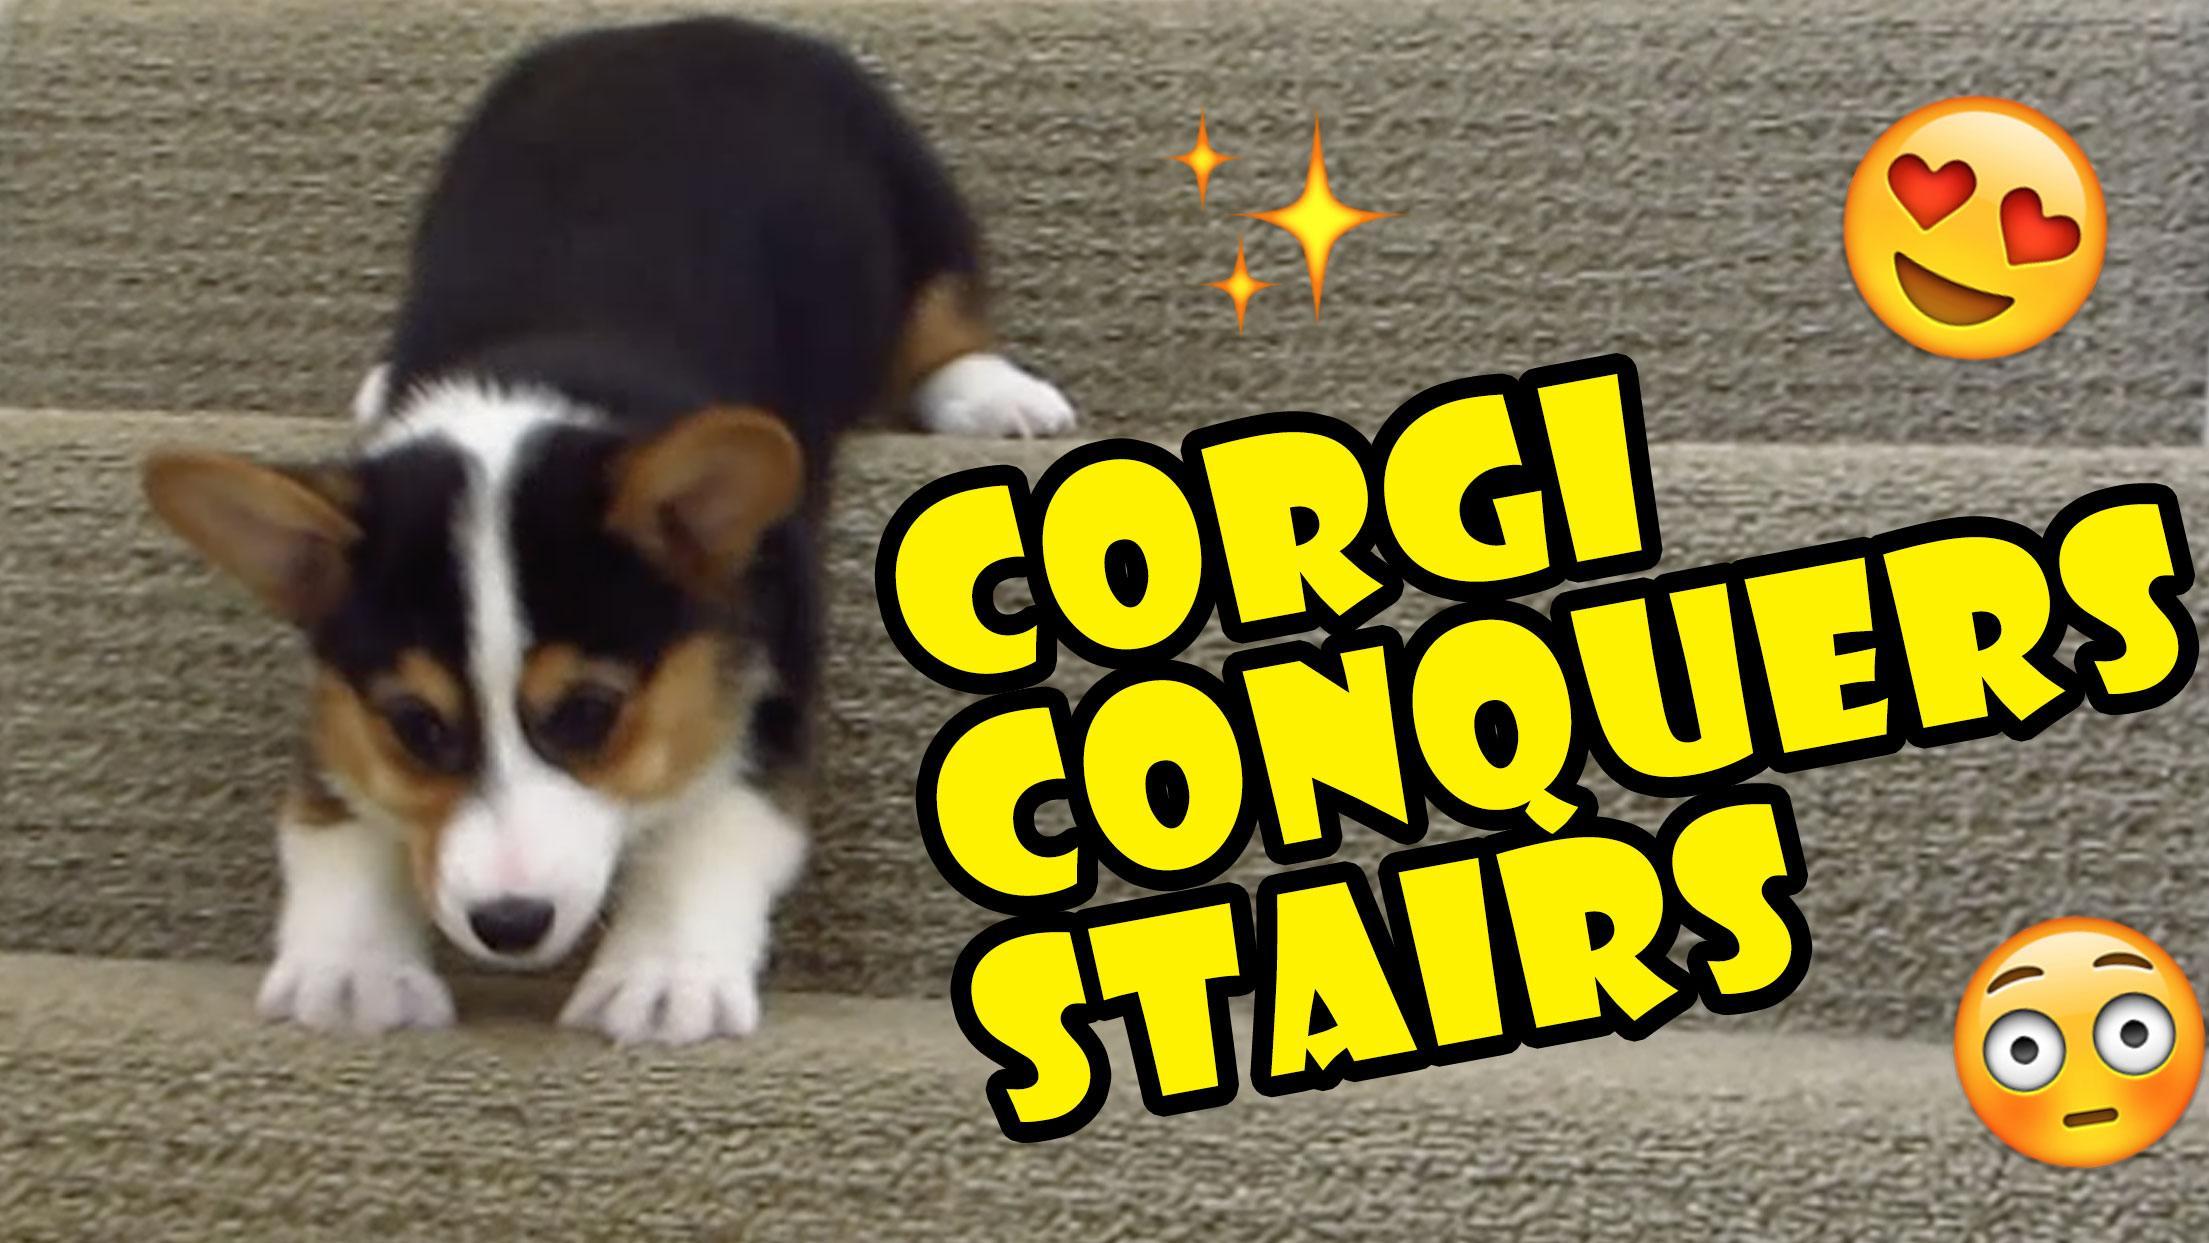 CORGI CONQUERS 163 STAIRS DESPITE SHORT LEGS